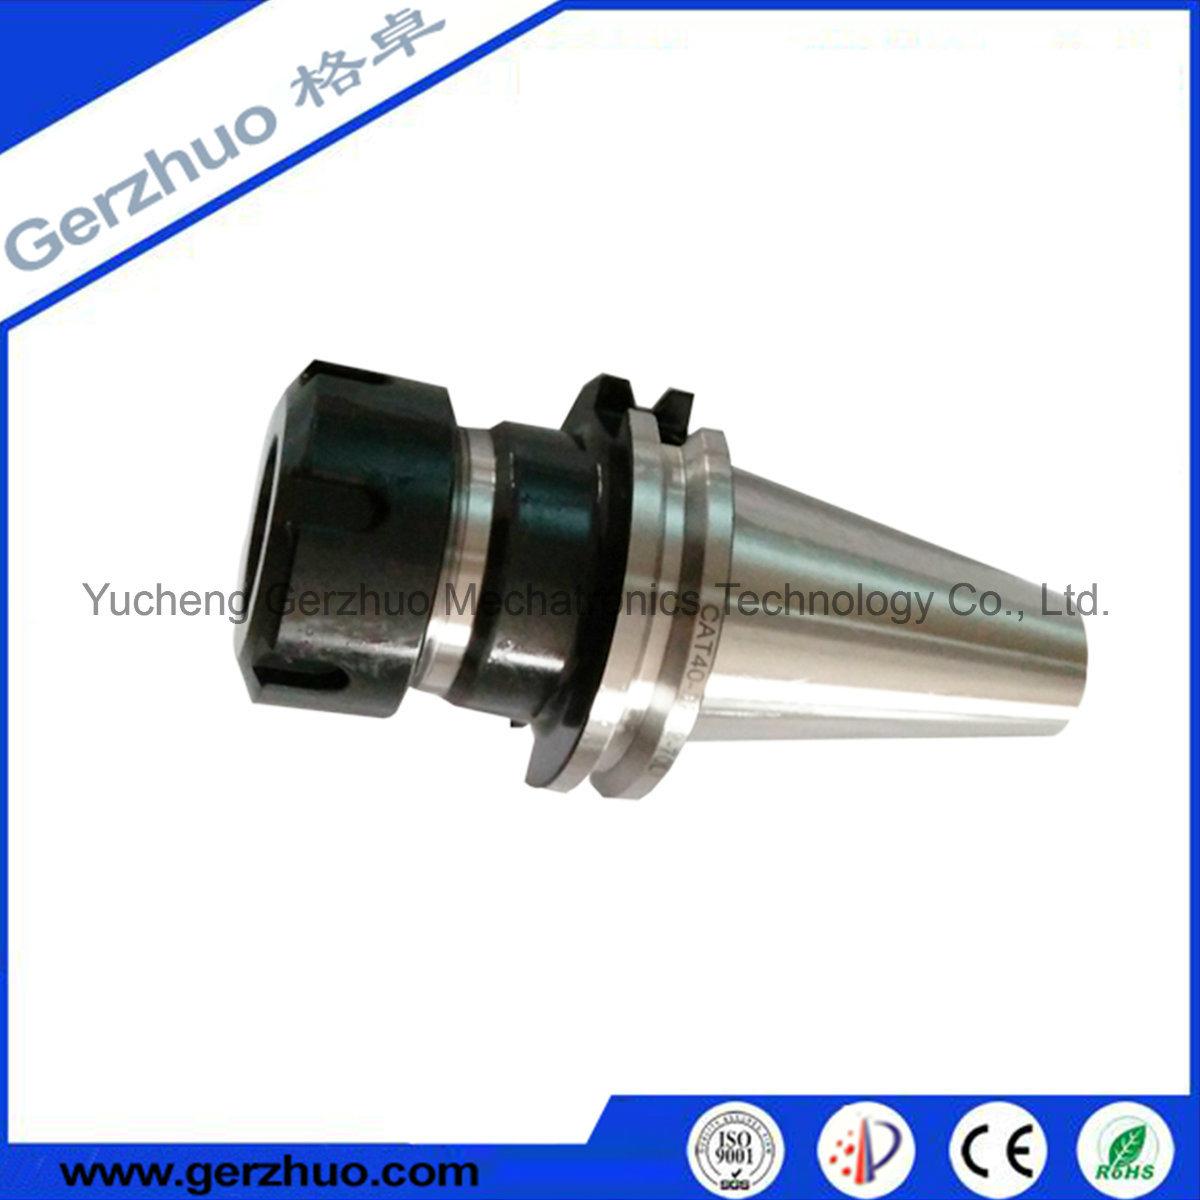 High precision CAT ER collet tool holder